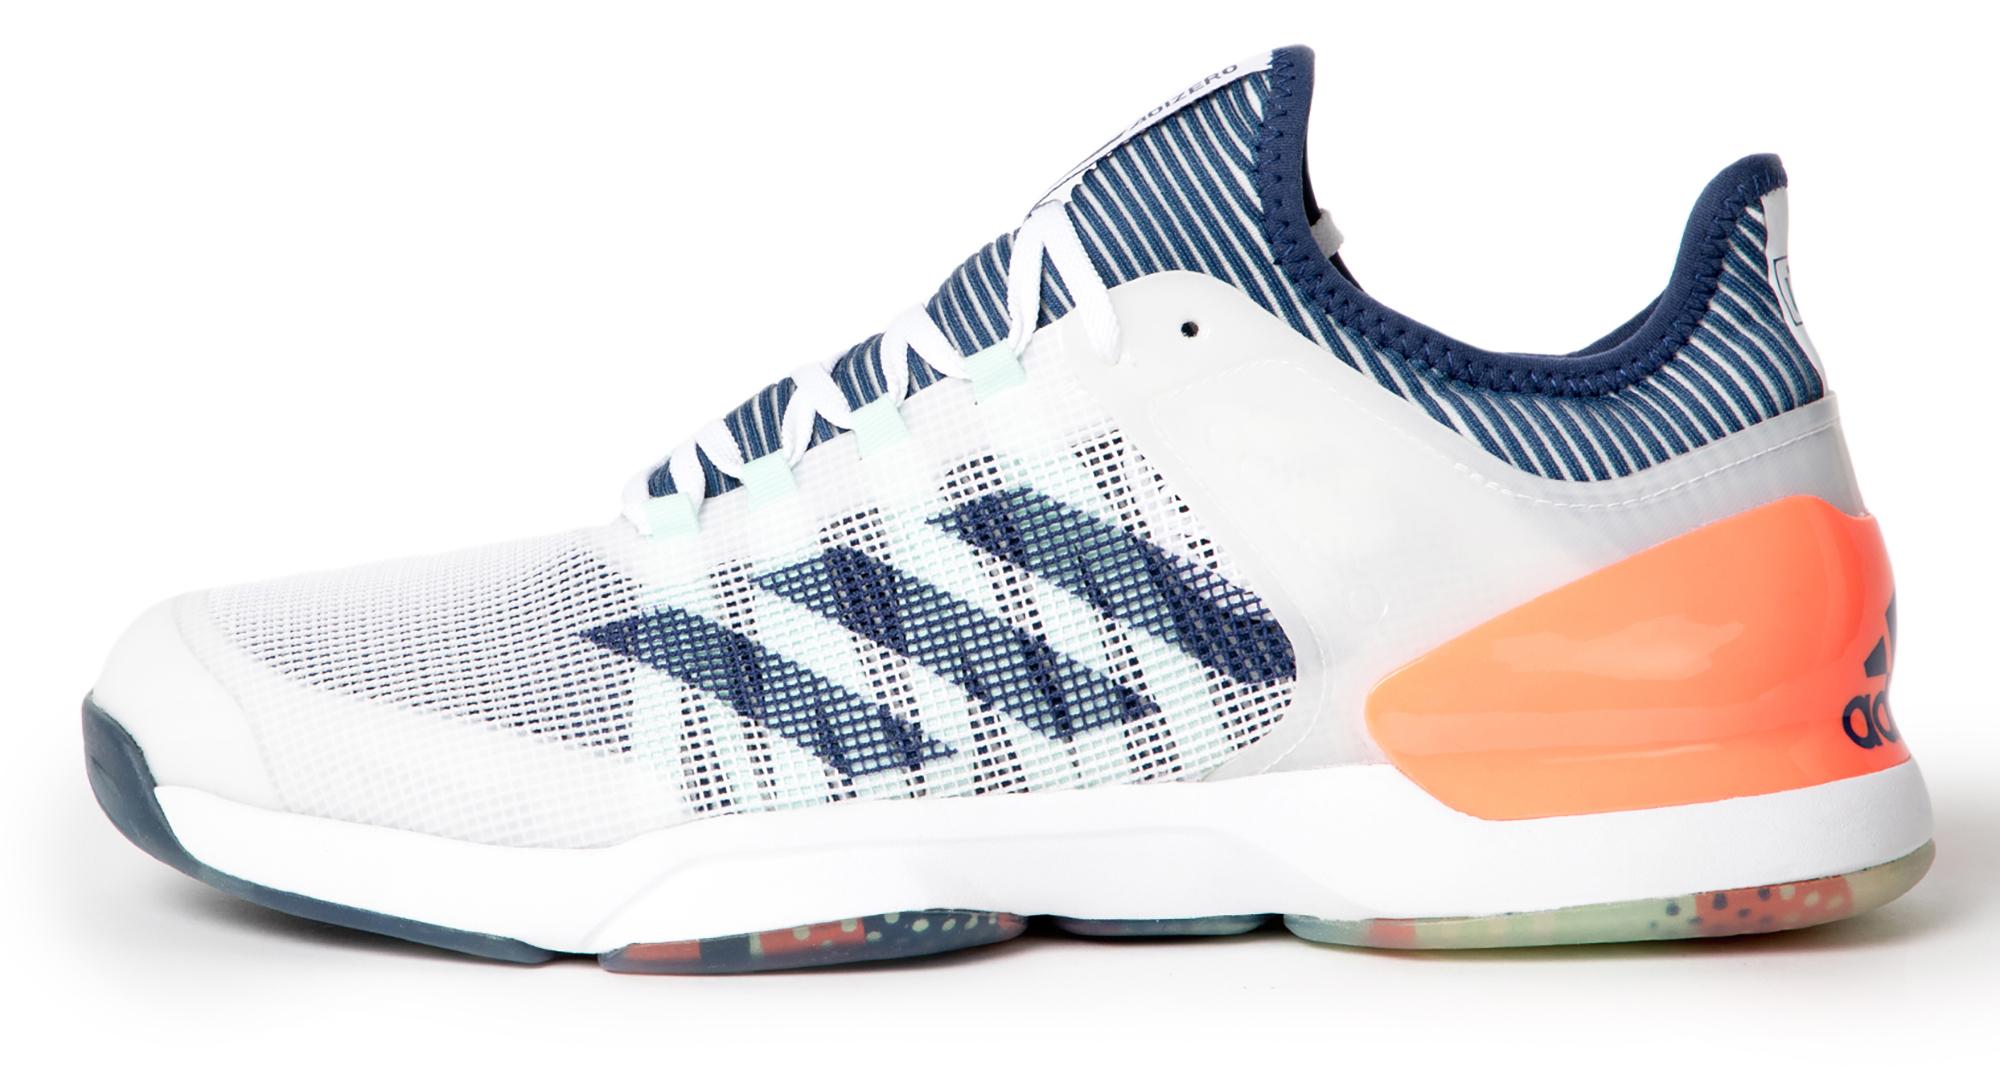 Adidas Кроссовки мужские Adidas Adizero Ubersonic 2, размер 41